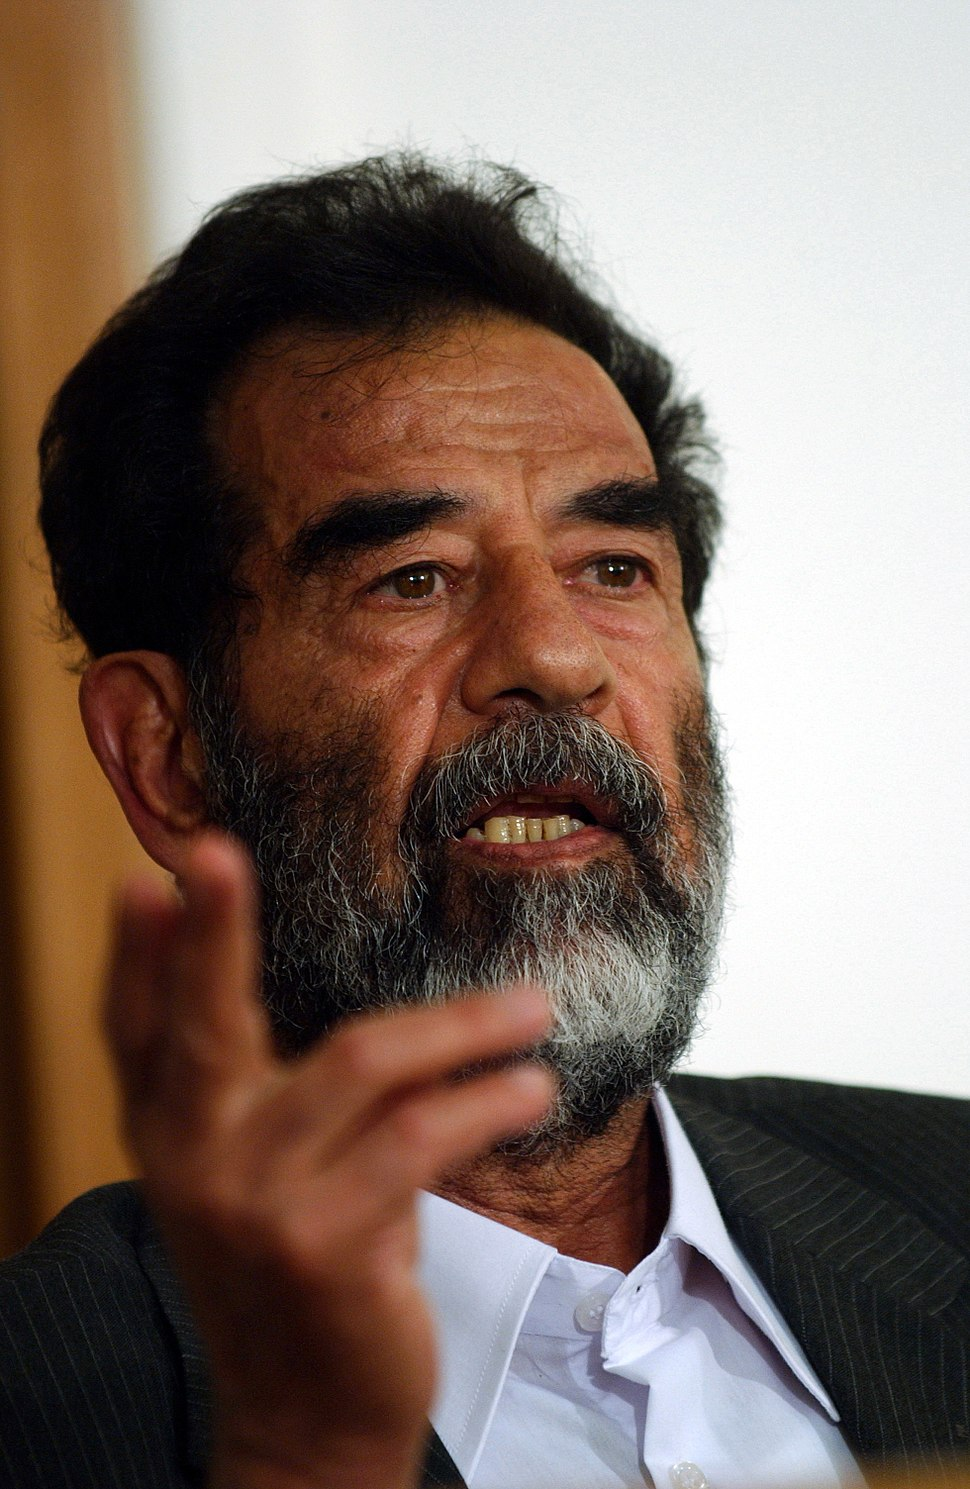 Saddam Hussein at trial, July 2004.JPEG